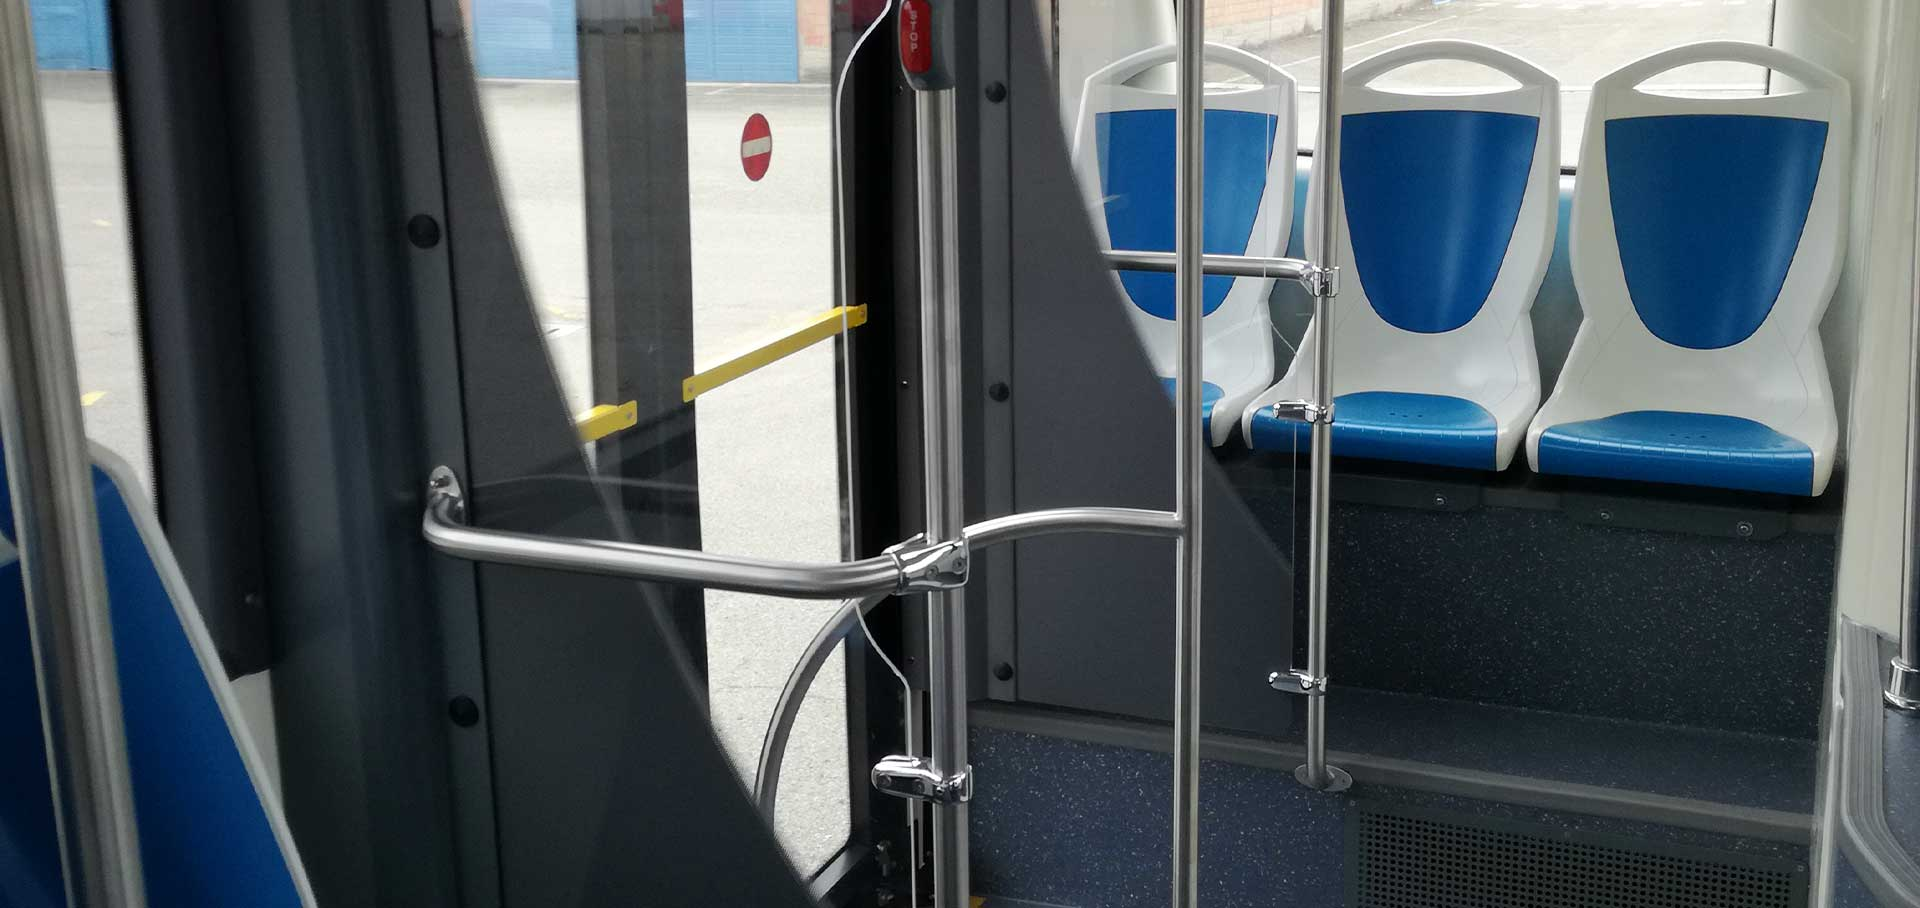 https://www.industriaitalianaautobus.com/wp-content/uploads/2021/05/bg-citymood-12-cng-1-1.jpg